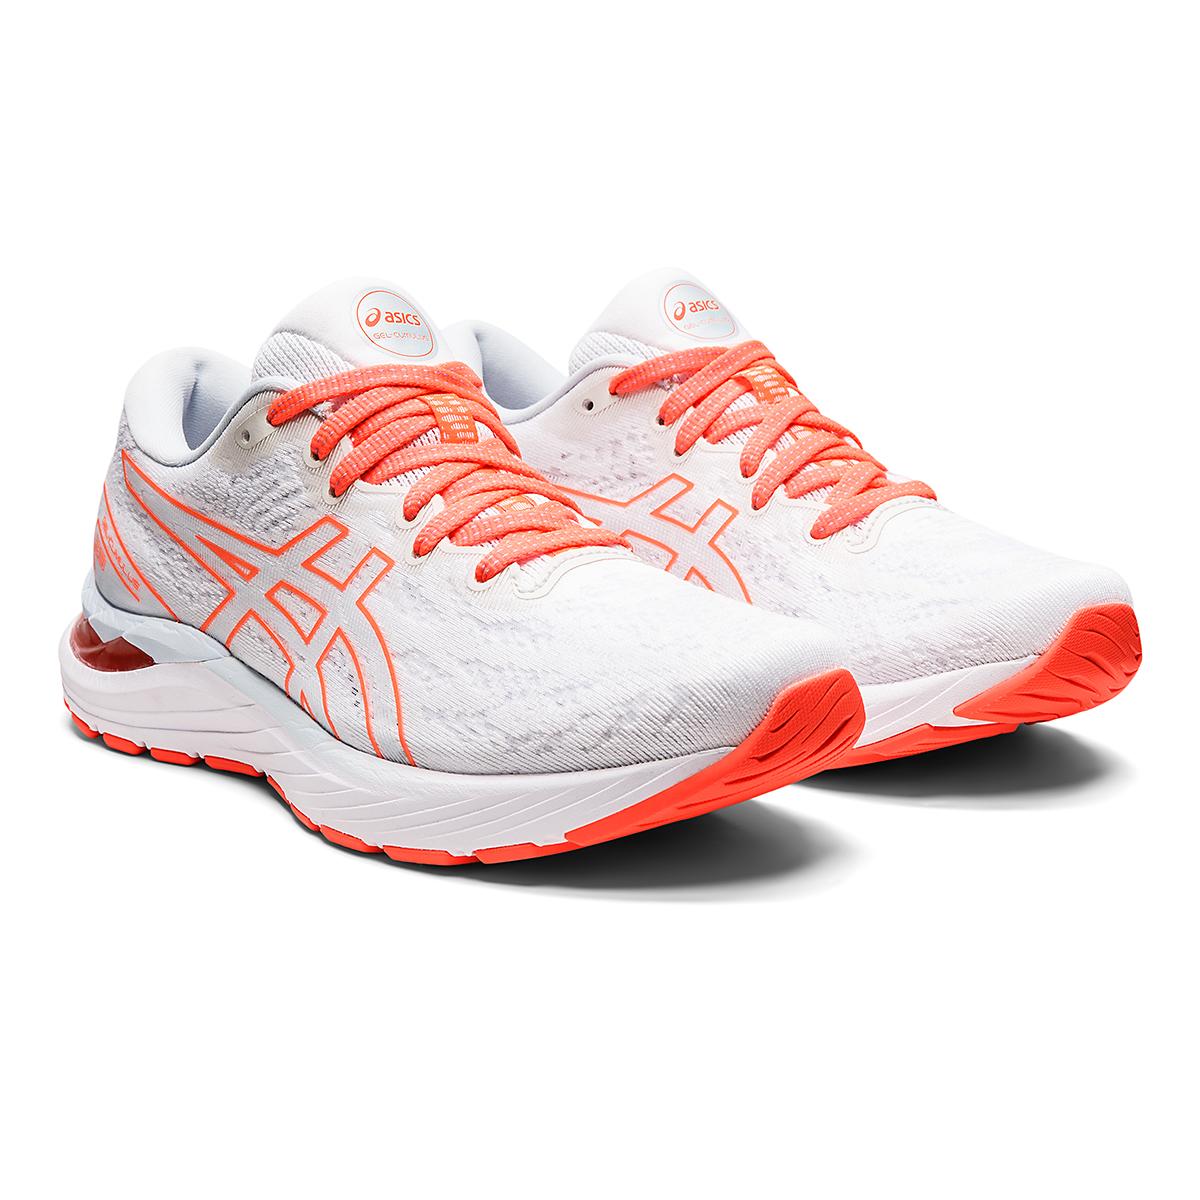 Women's Asics Gel-Cumulus 23 Running Shoe - Color: White/Sky - JackRabbit Exclusive - Size: 5 - Width: Regular, White/Sky - JackRabbit Exclusive, large, image 3